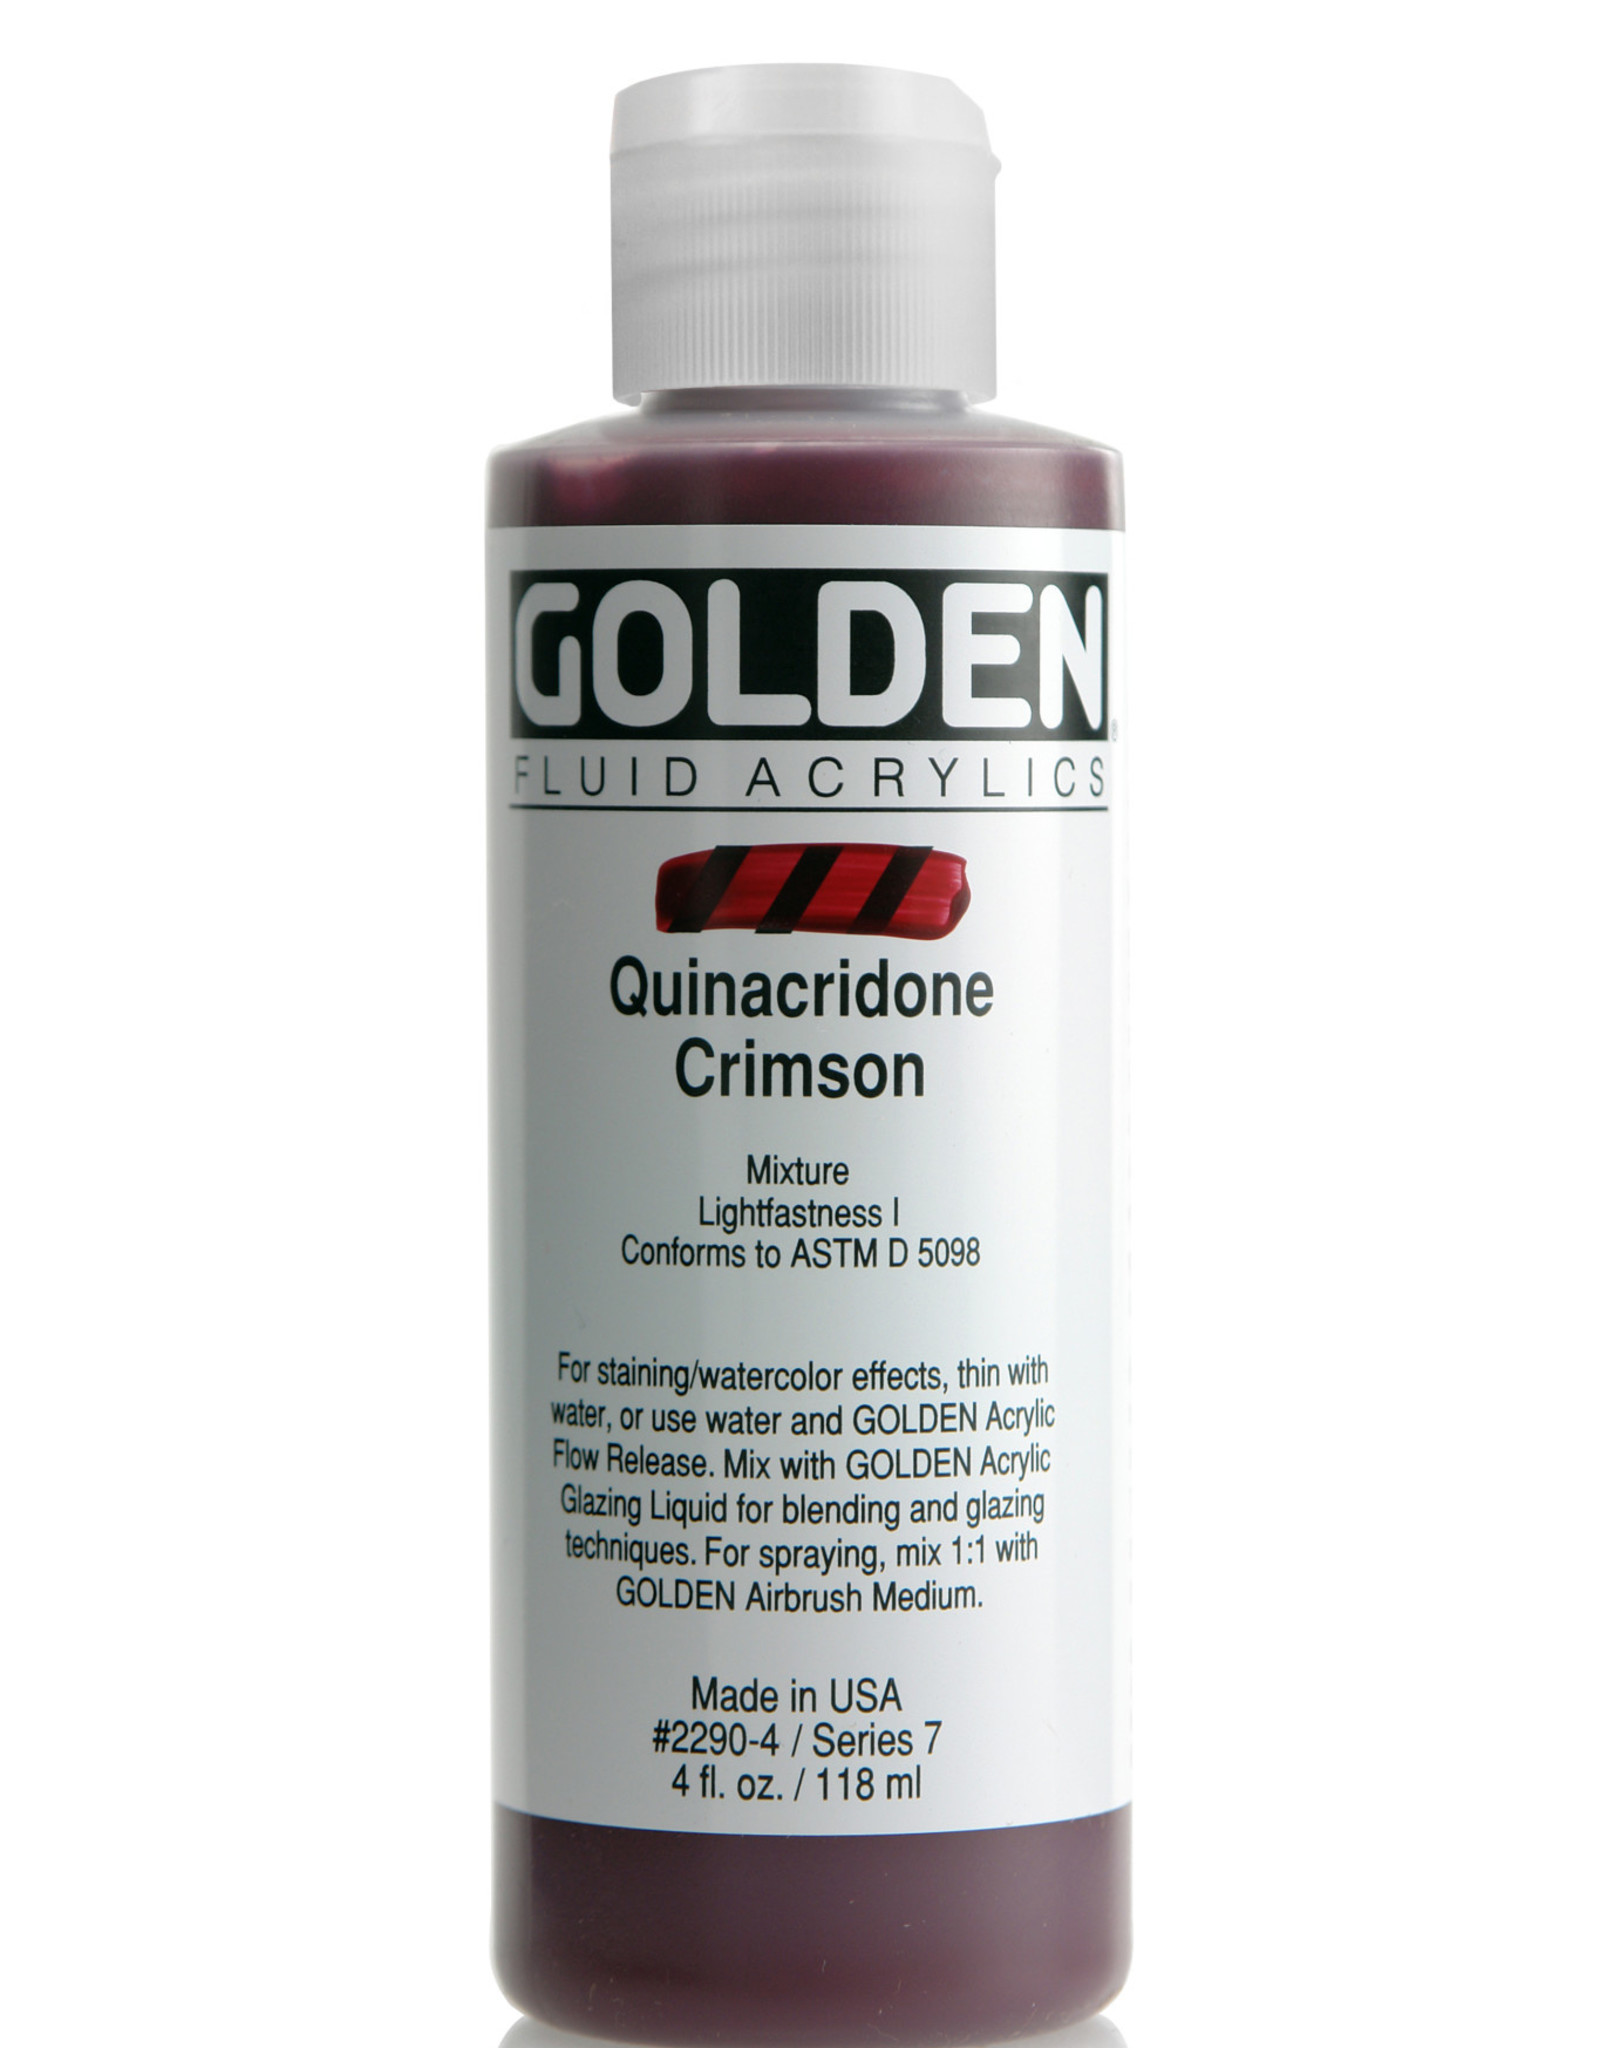 Golden Fluid Acrylic Paint, Quinacridone Crimson, Series 7, 4fl.oz, Bottle